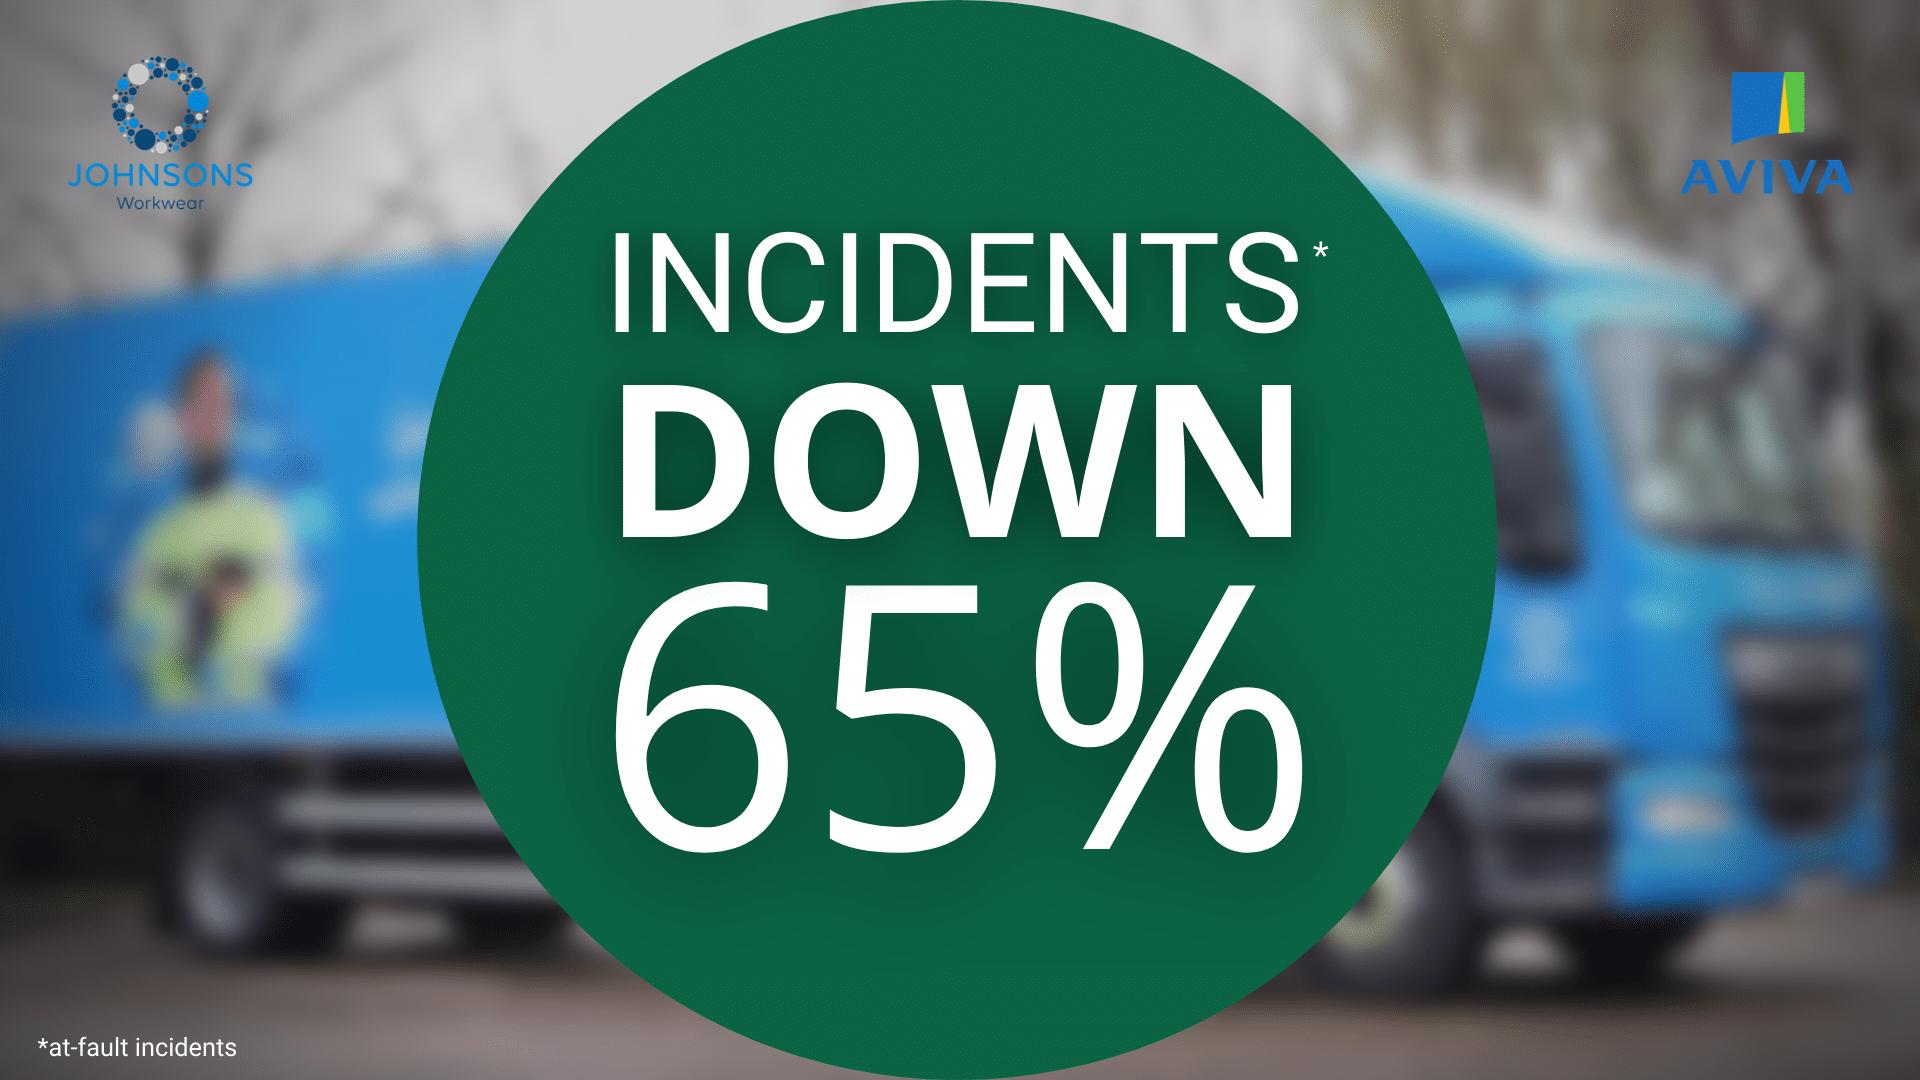 Johnsons Workwear 65% Incident Decline